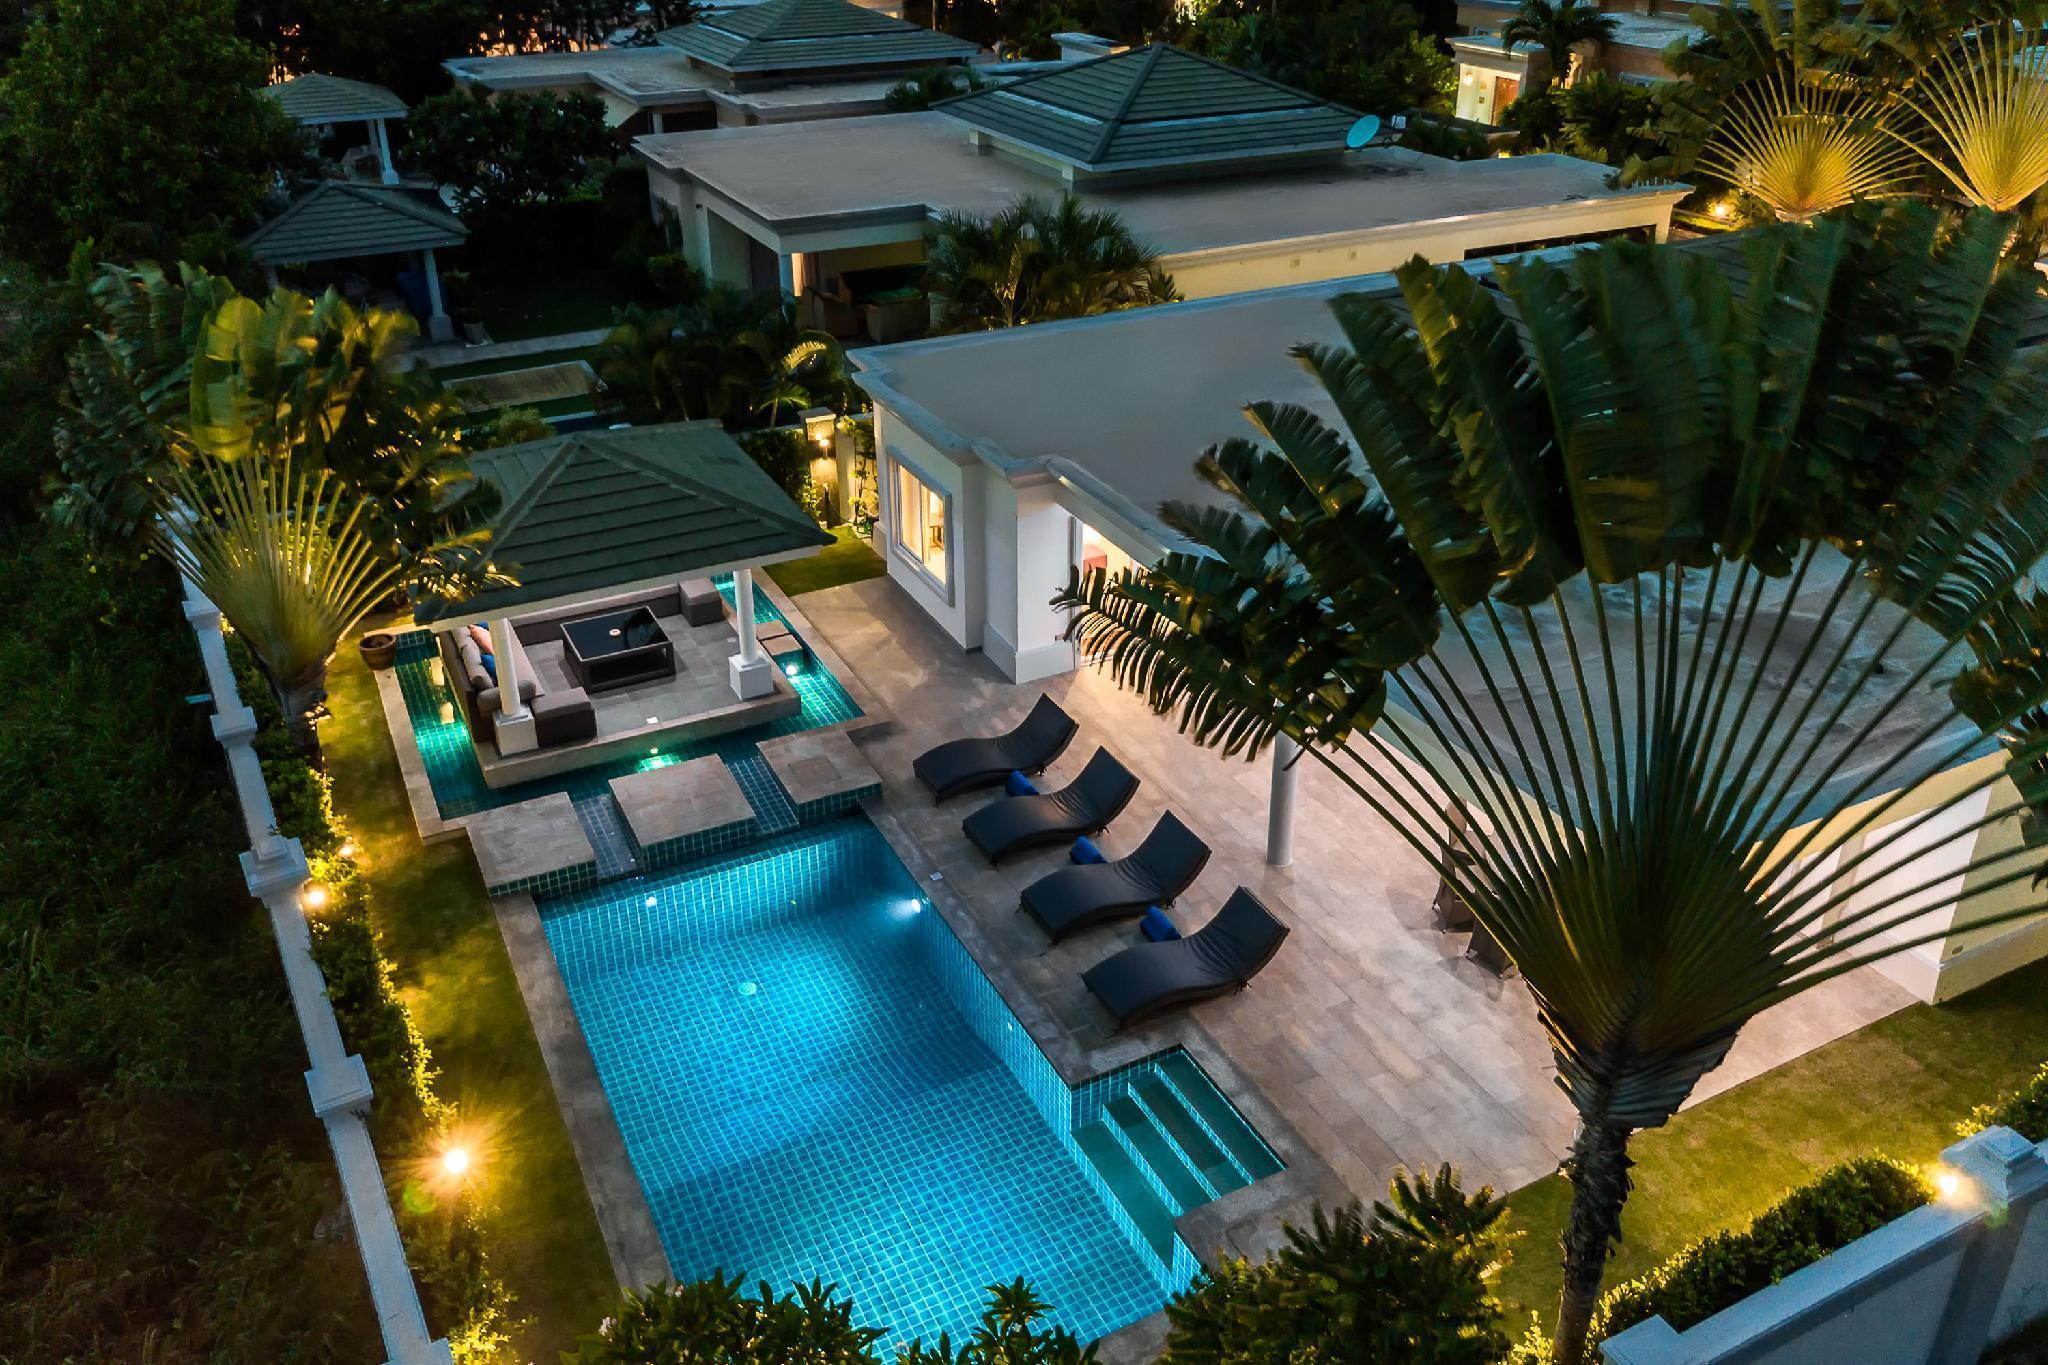 Luxury Pool Villa 608 / 4 BR 8-10 Persons Luxury Pool Villa 608 / 4 BR 8-10 Persons